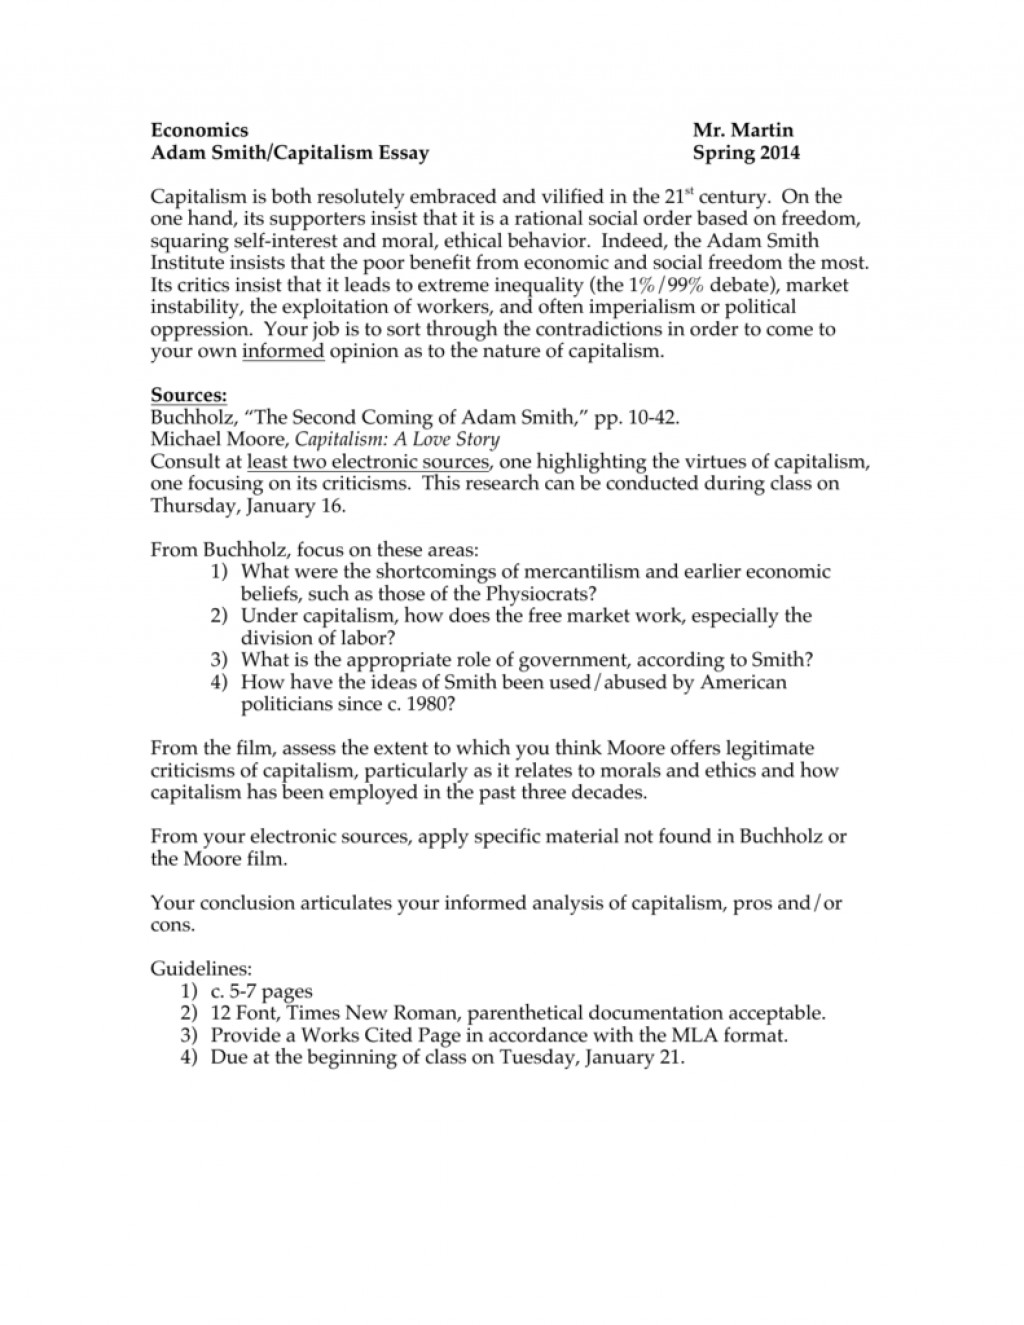 004 Essay Example Capitalism 007998055 1 Breathtaking Topics Question Pdf Large